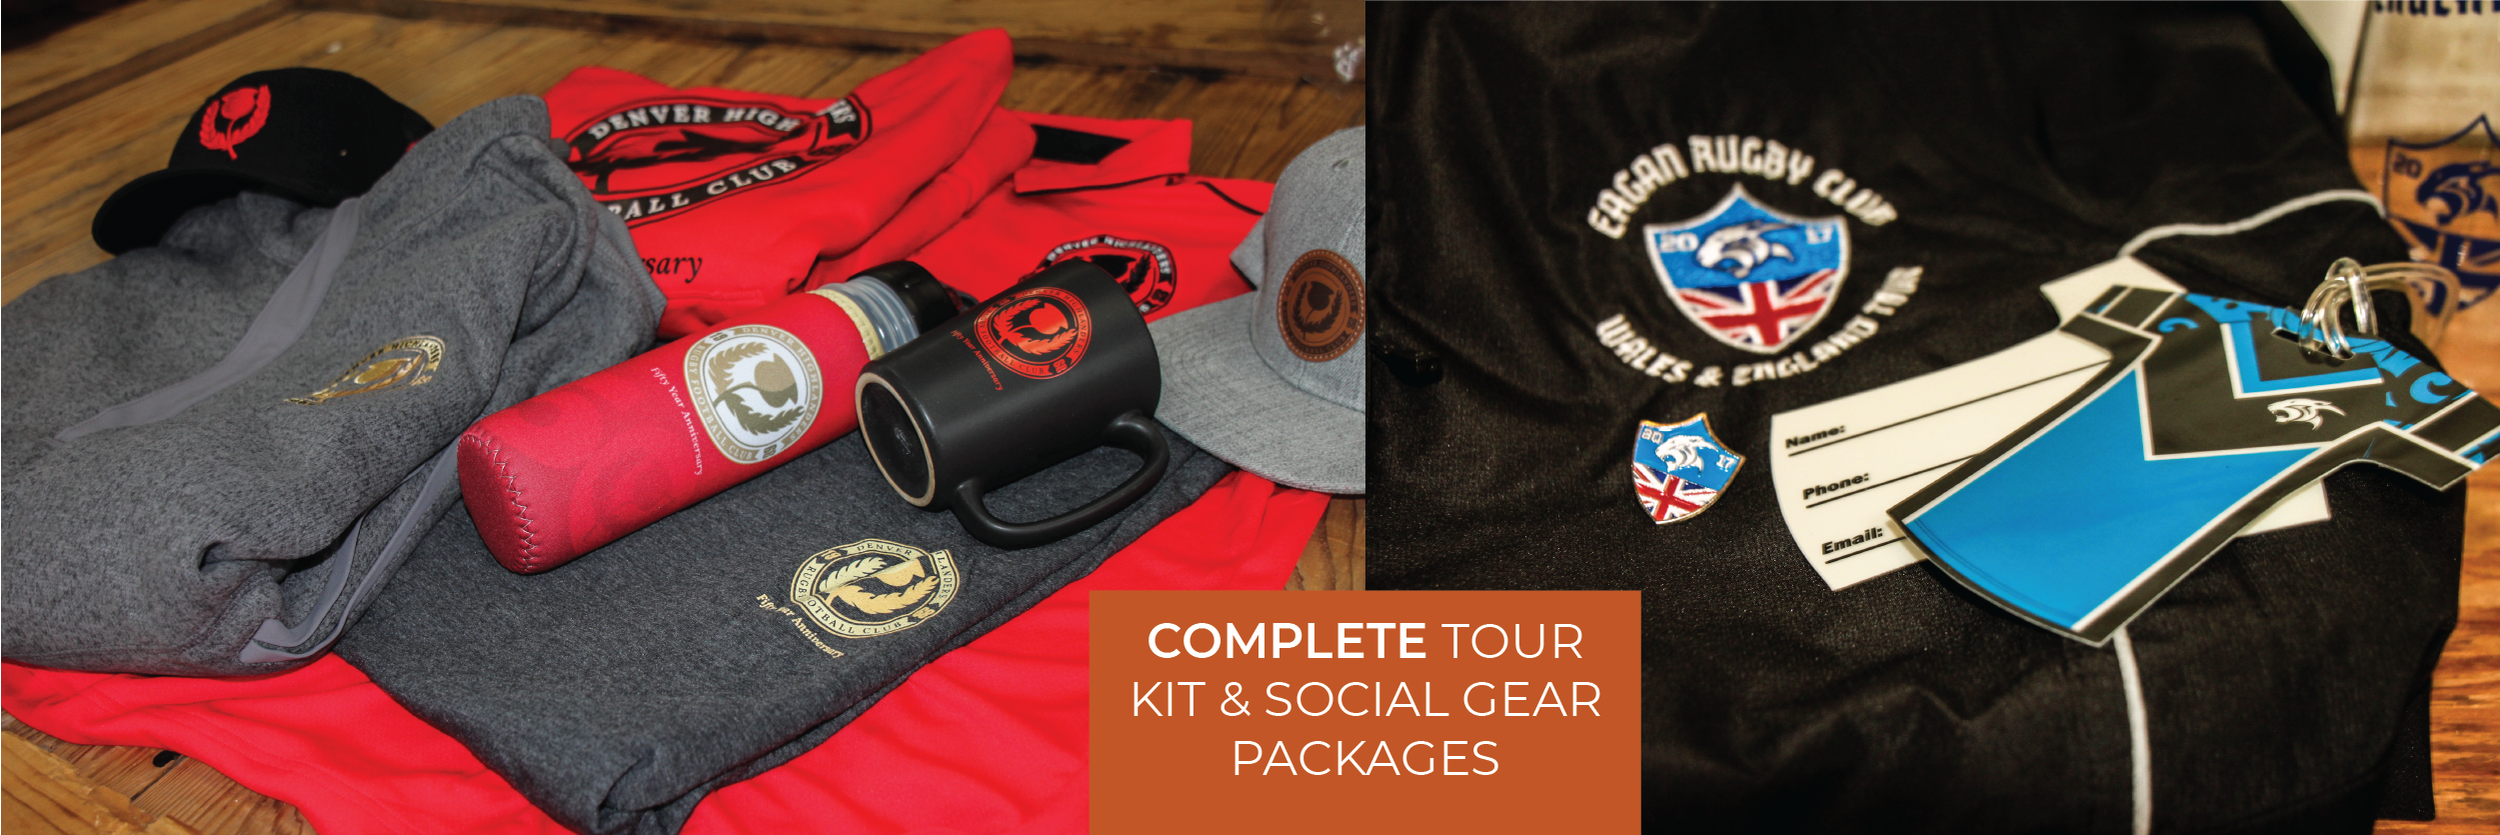 RA WEB IMAGES_Tour Kit.png